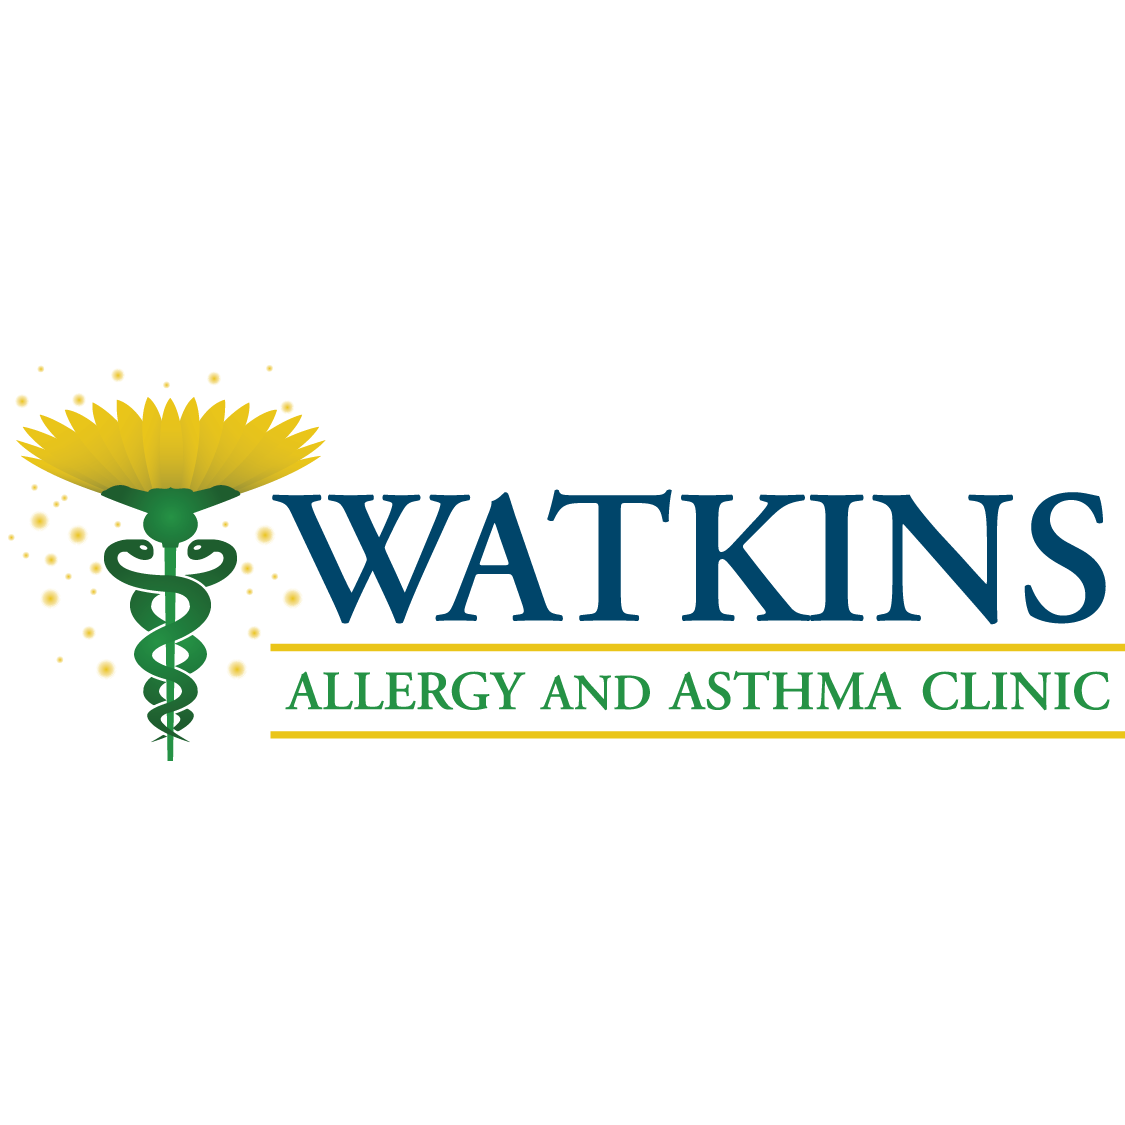 Watkins Allergy and Asthma Clinic Bartram Park Office - Jacksonville, FL - Allergy & Immunology